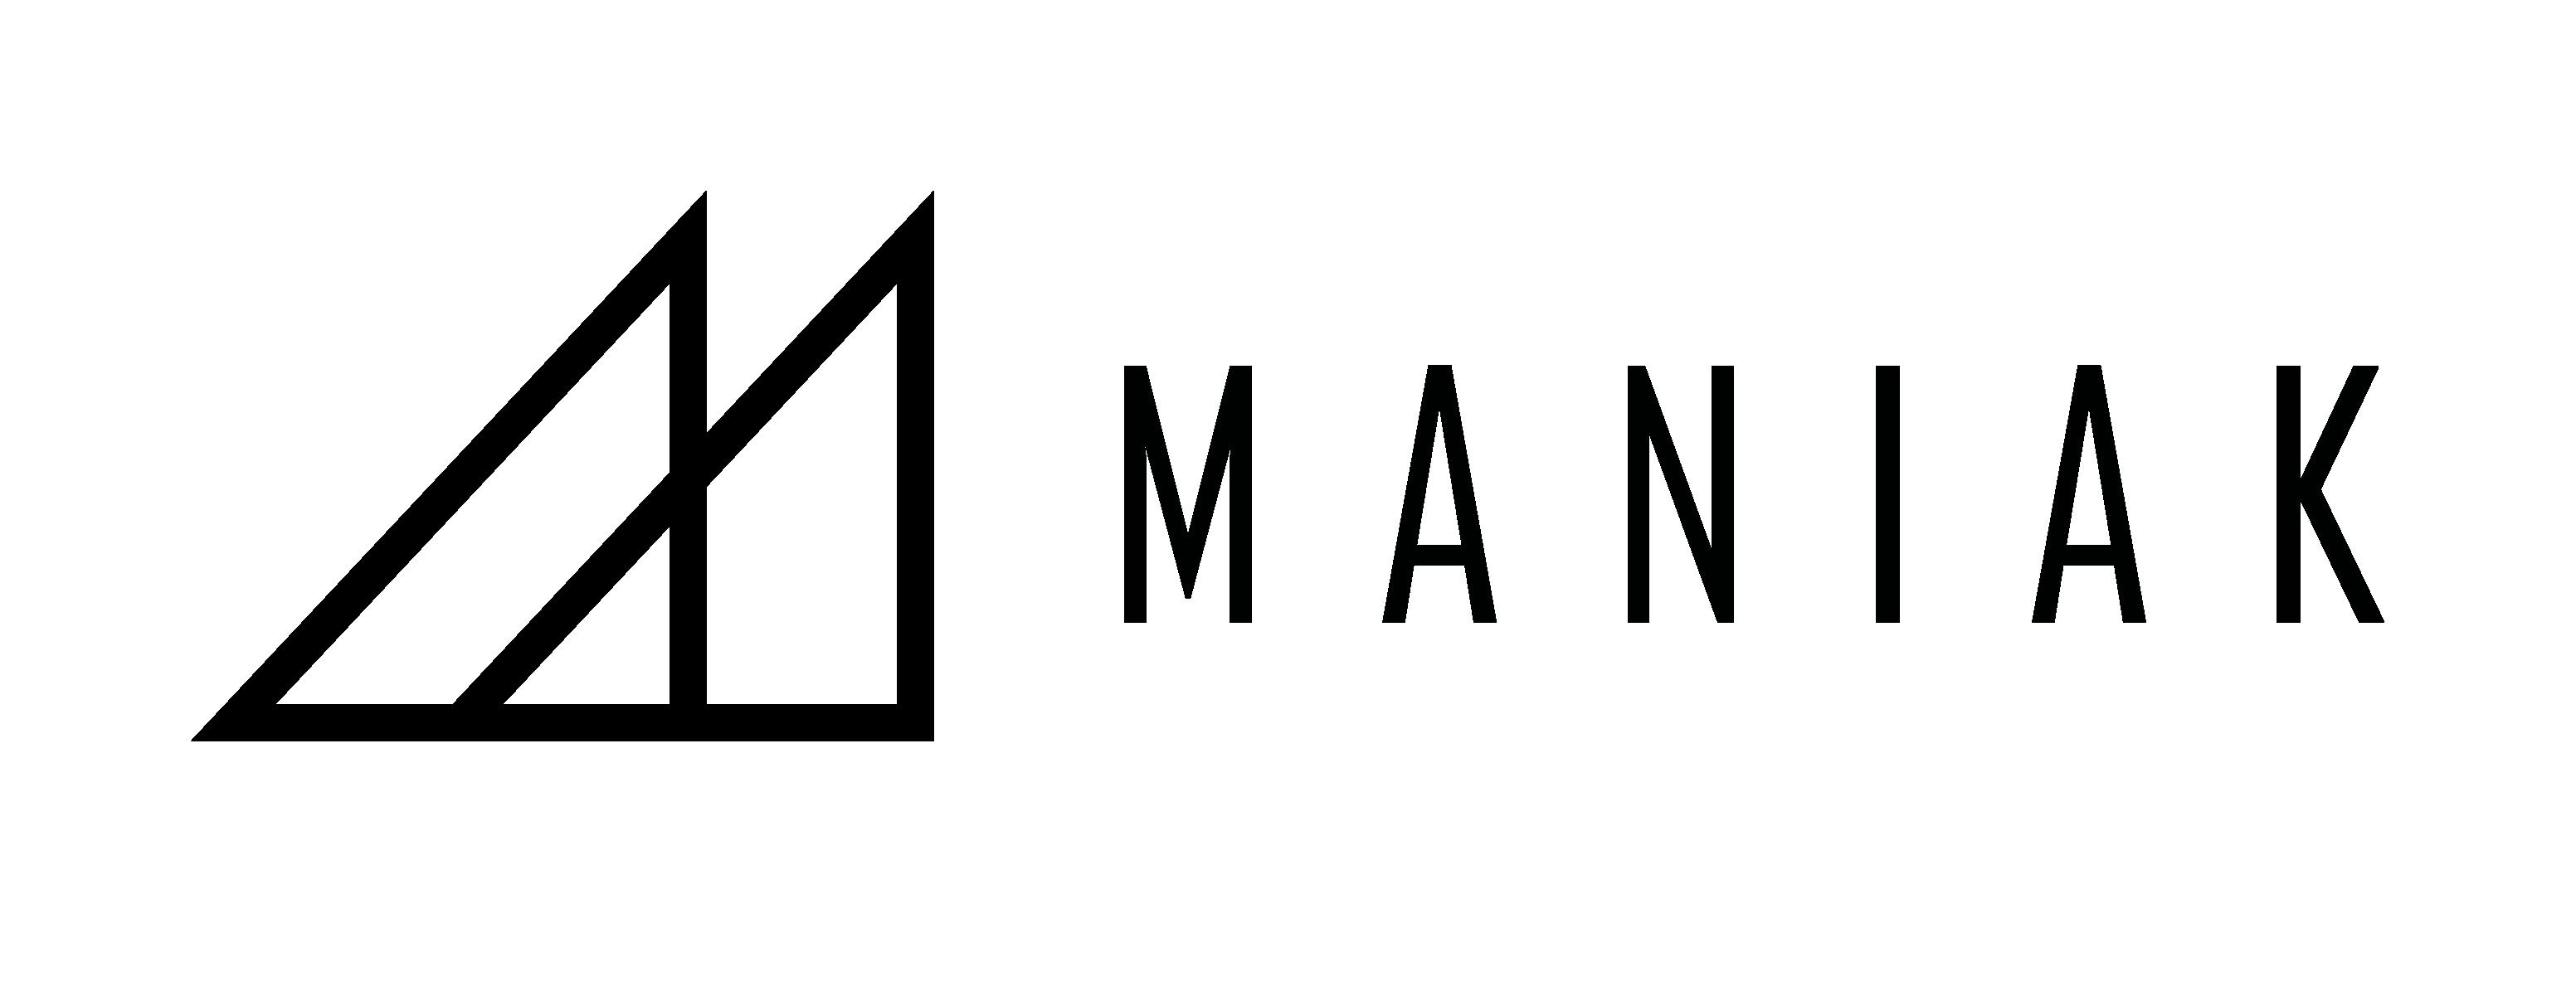 Maniak black horizontal logo rvb